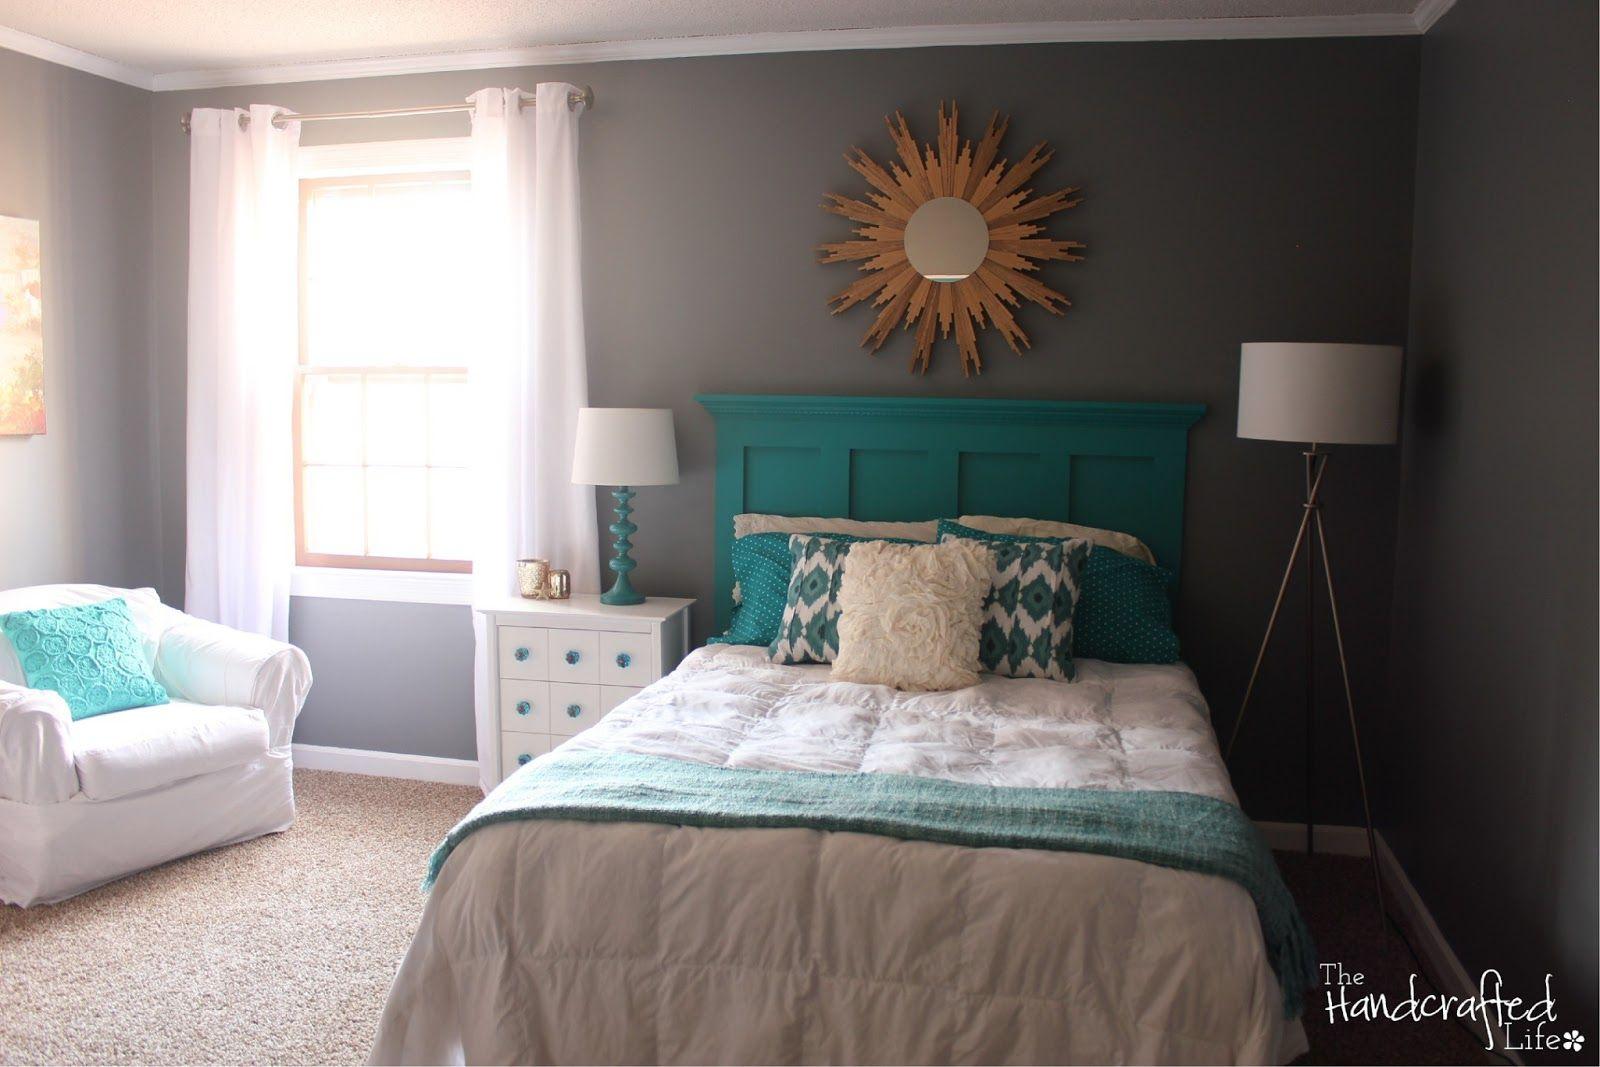 Trendy Master Bedroom Photo In San Francisco With Dark Hardwood Floors And Gray Walls Teal Bedroom Walls Beautiful Bedroom Designs Teal Bedroom